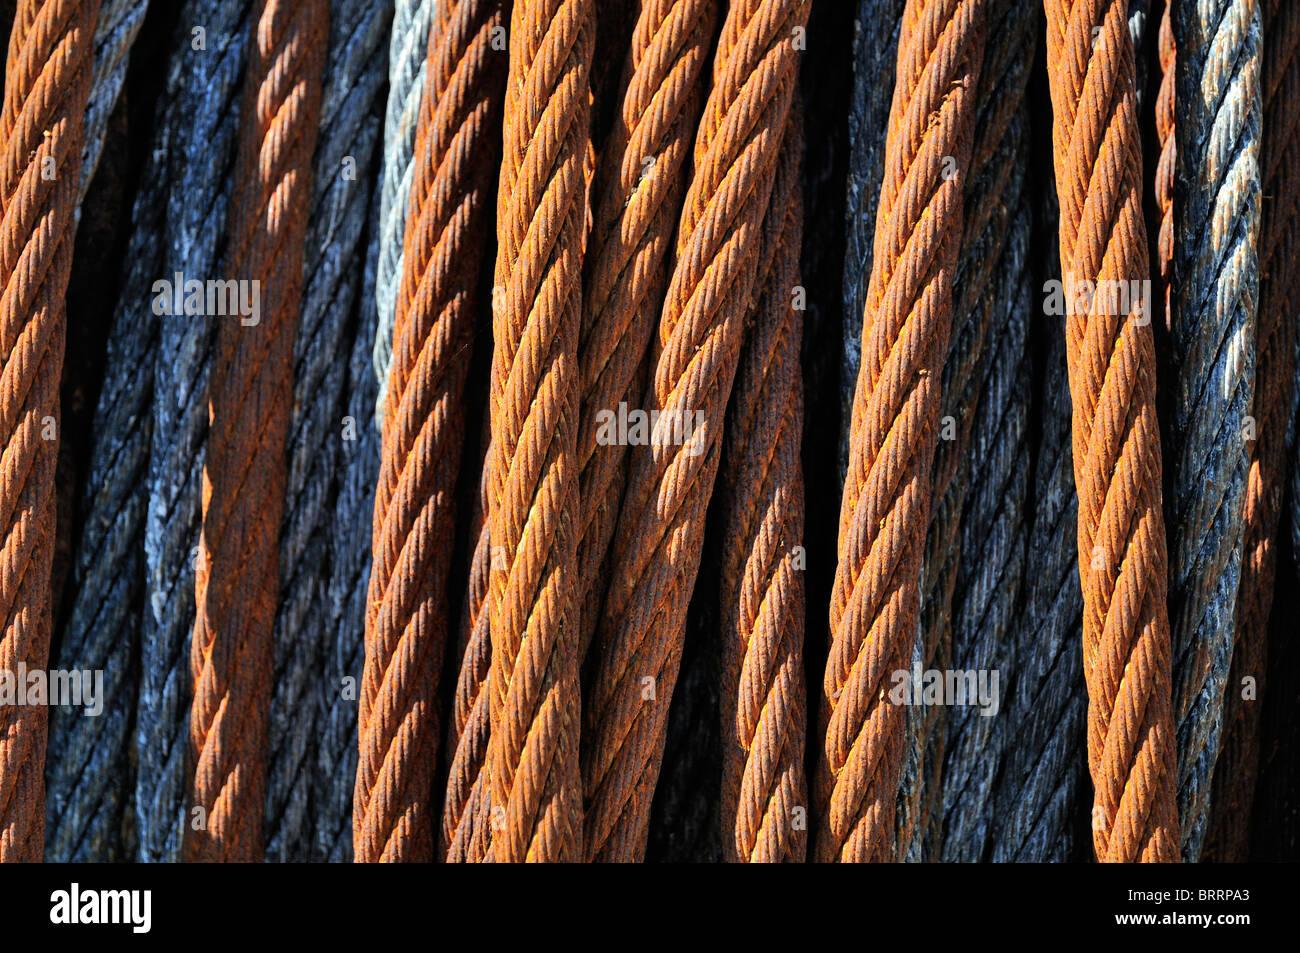 Cable Scrap Stockfotos & Cable Scrap Bilder - Alamy